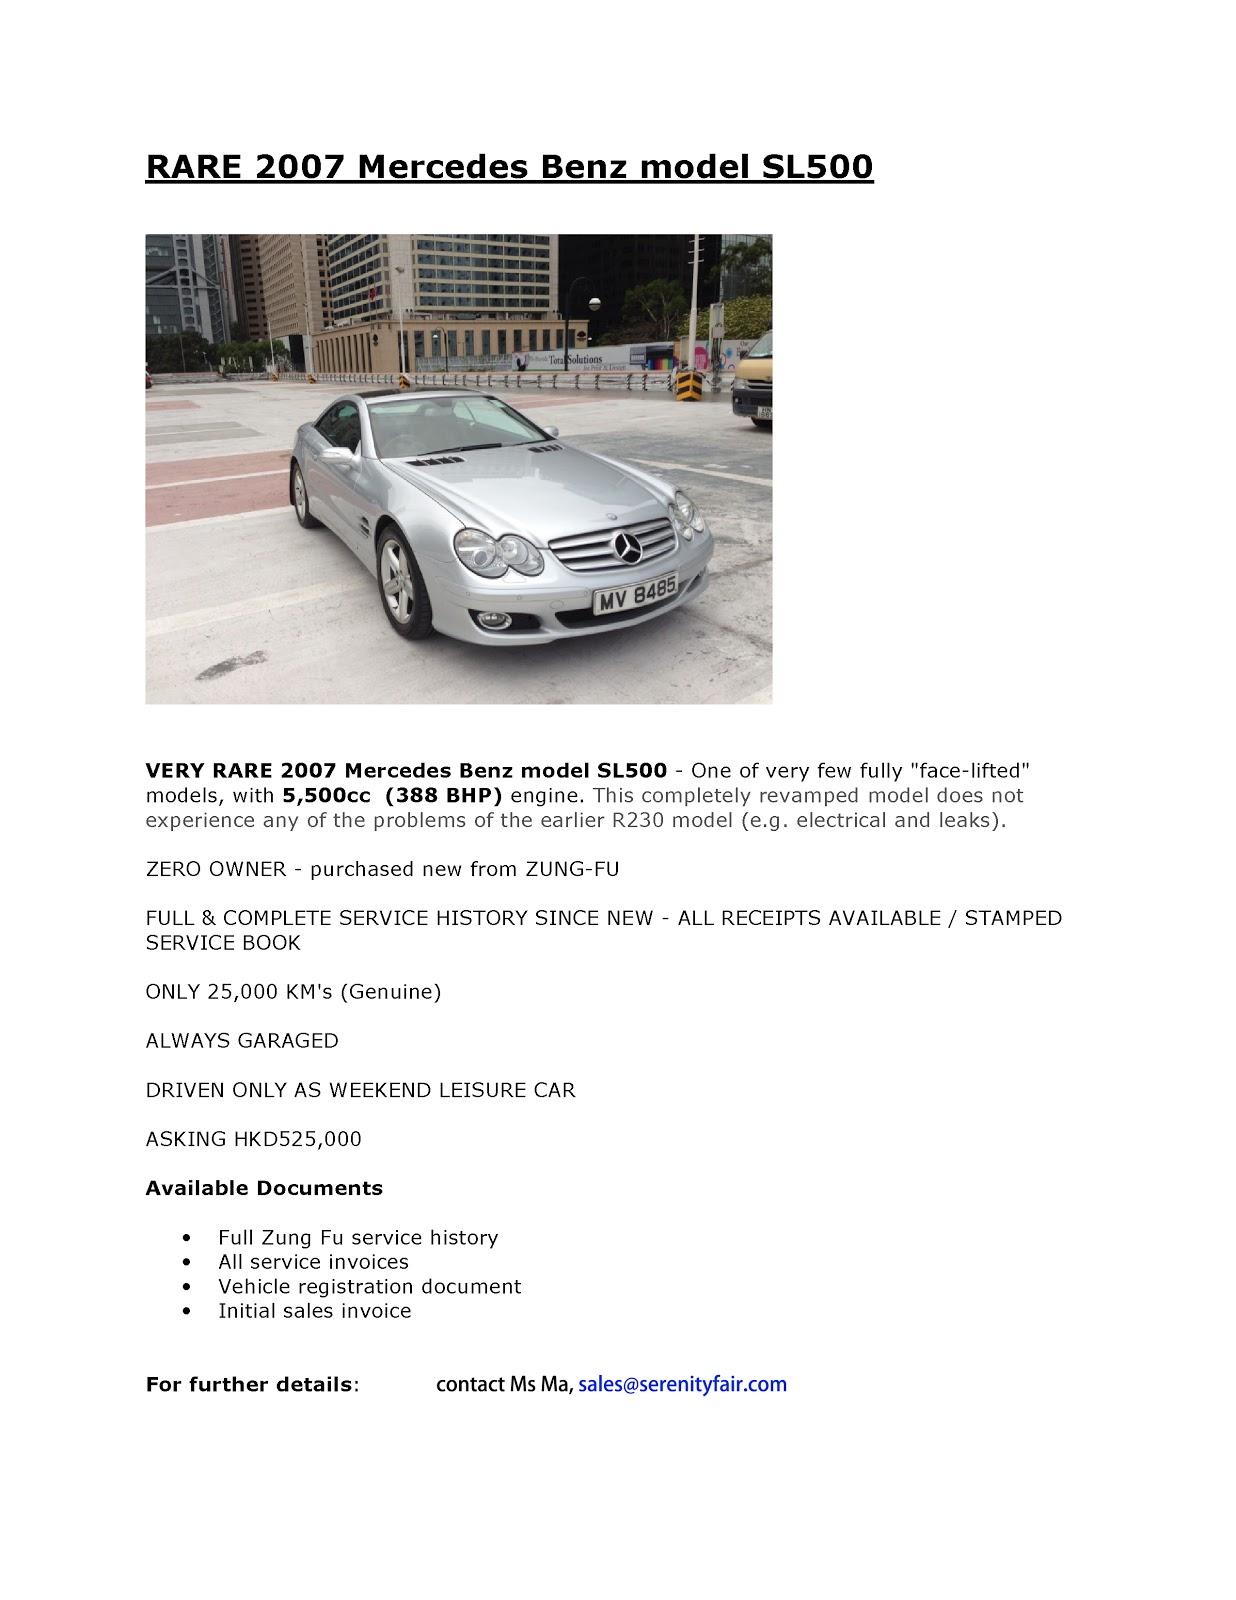 Car Sale Flyer Aprilonthemarchco - Car for sale flyer template free